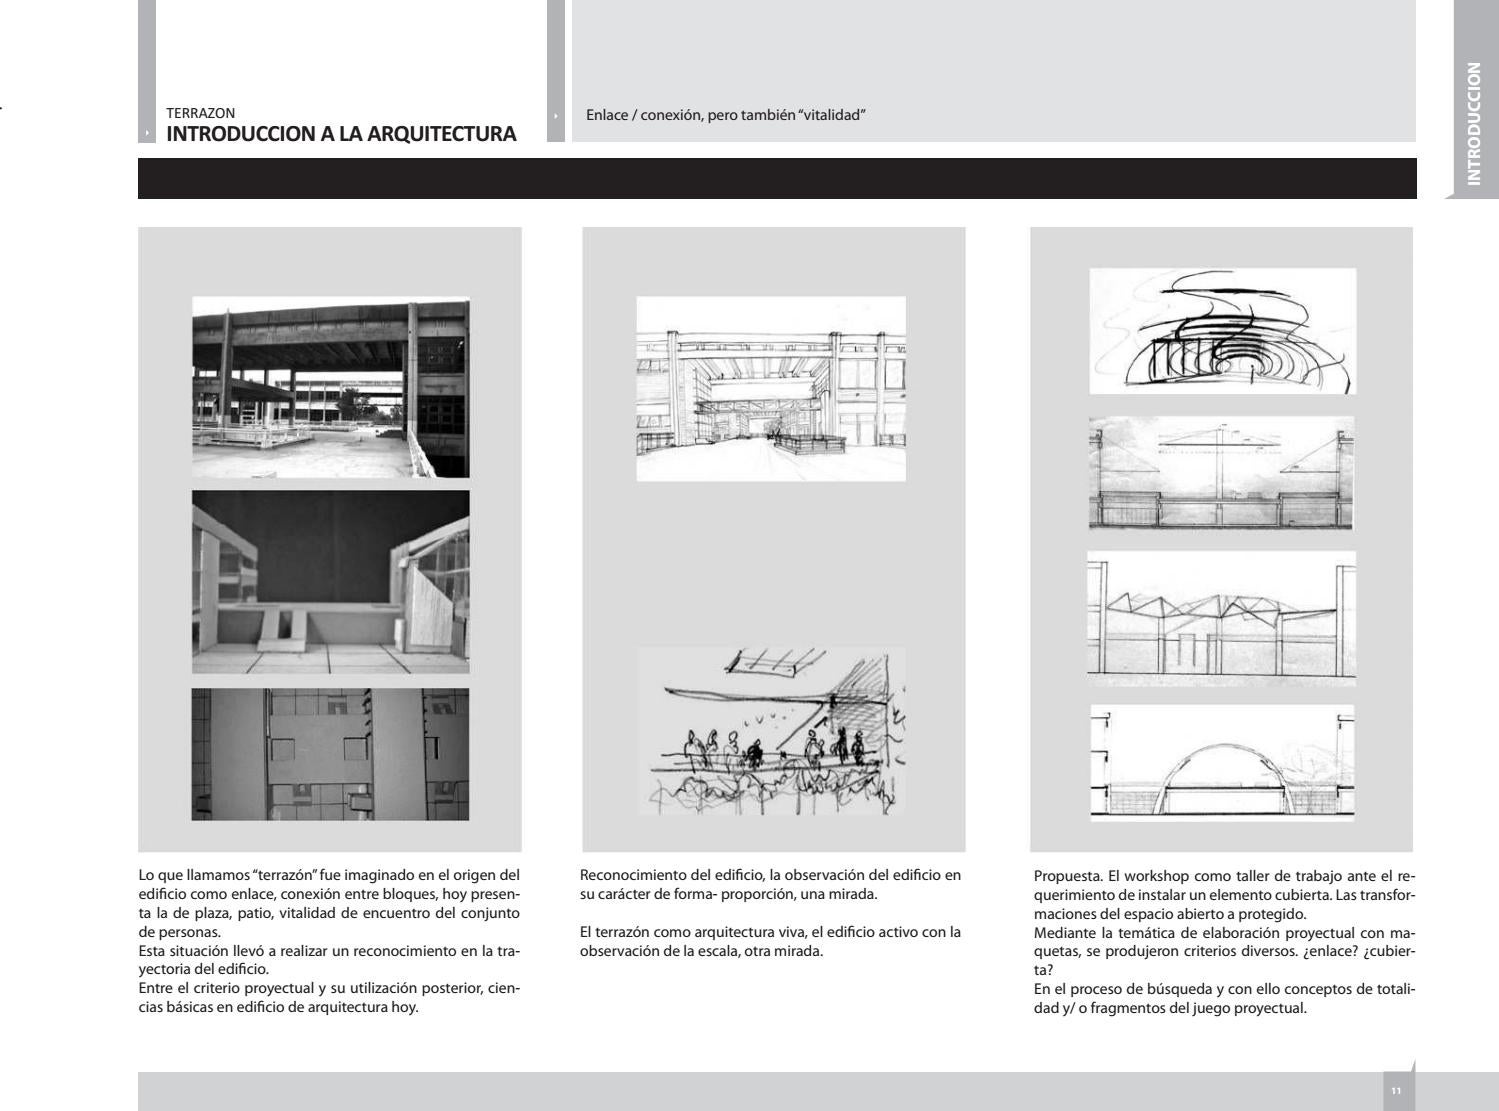 Anuario 2007 by FAPyD UNR - issuu